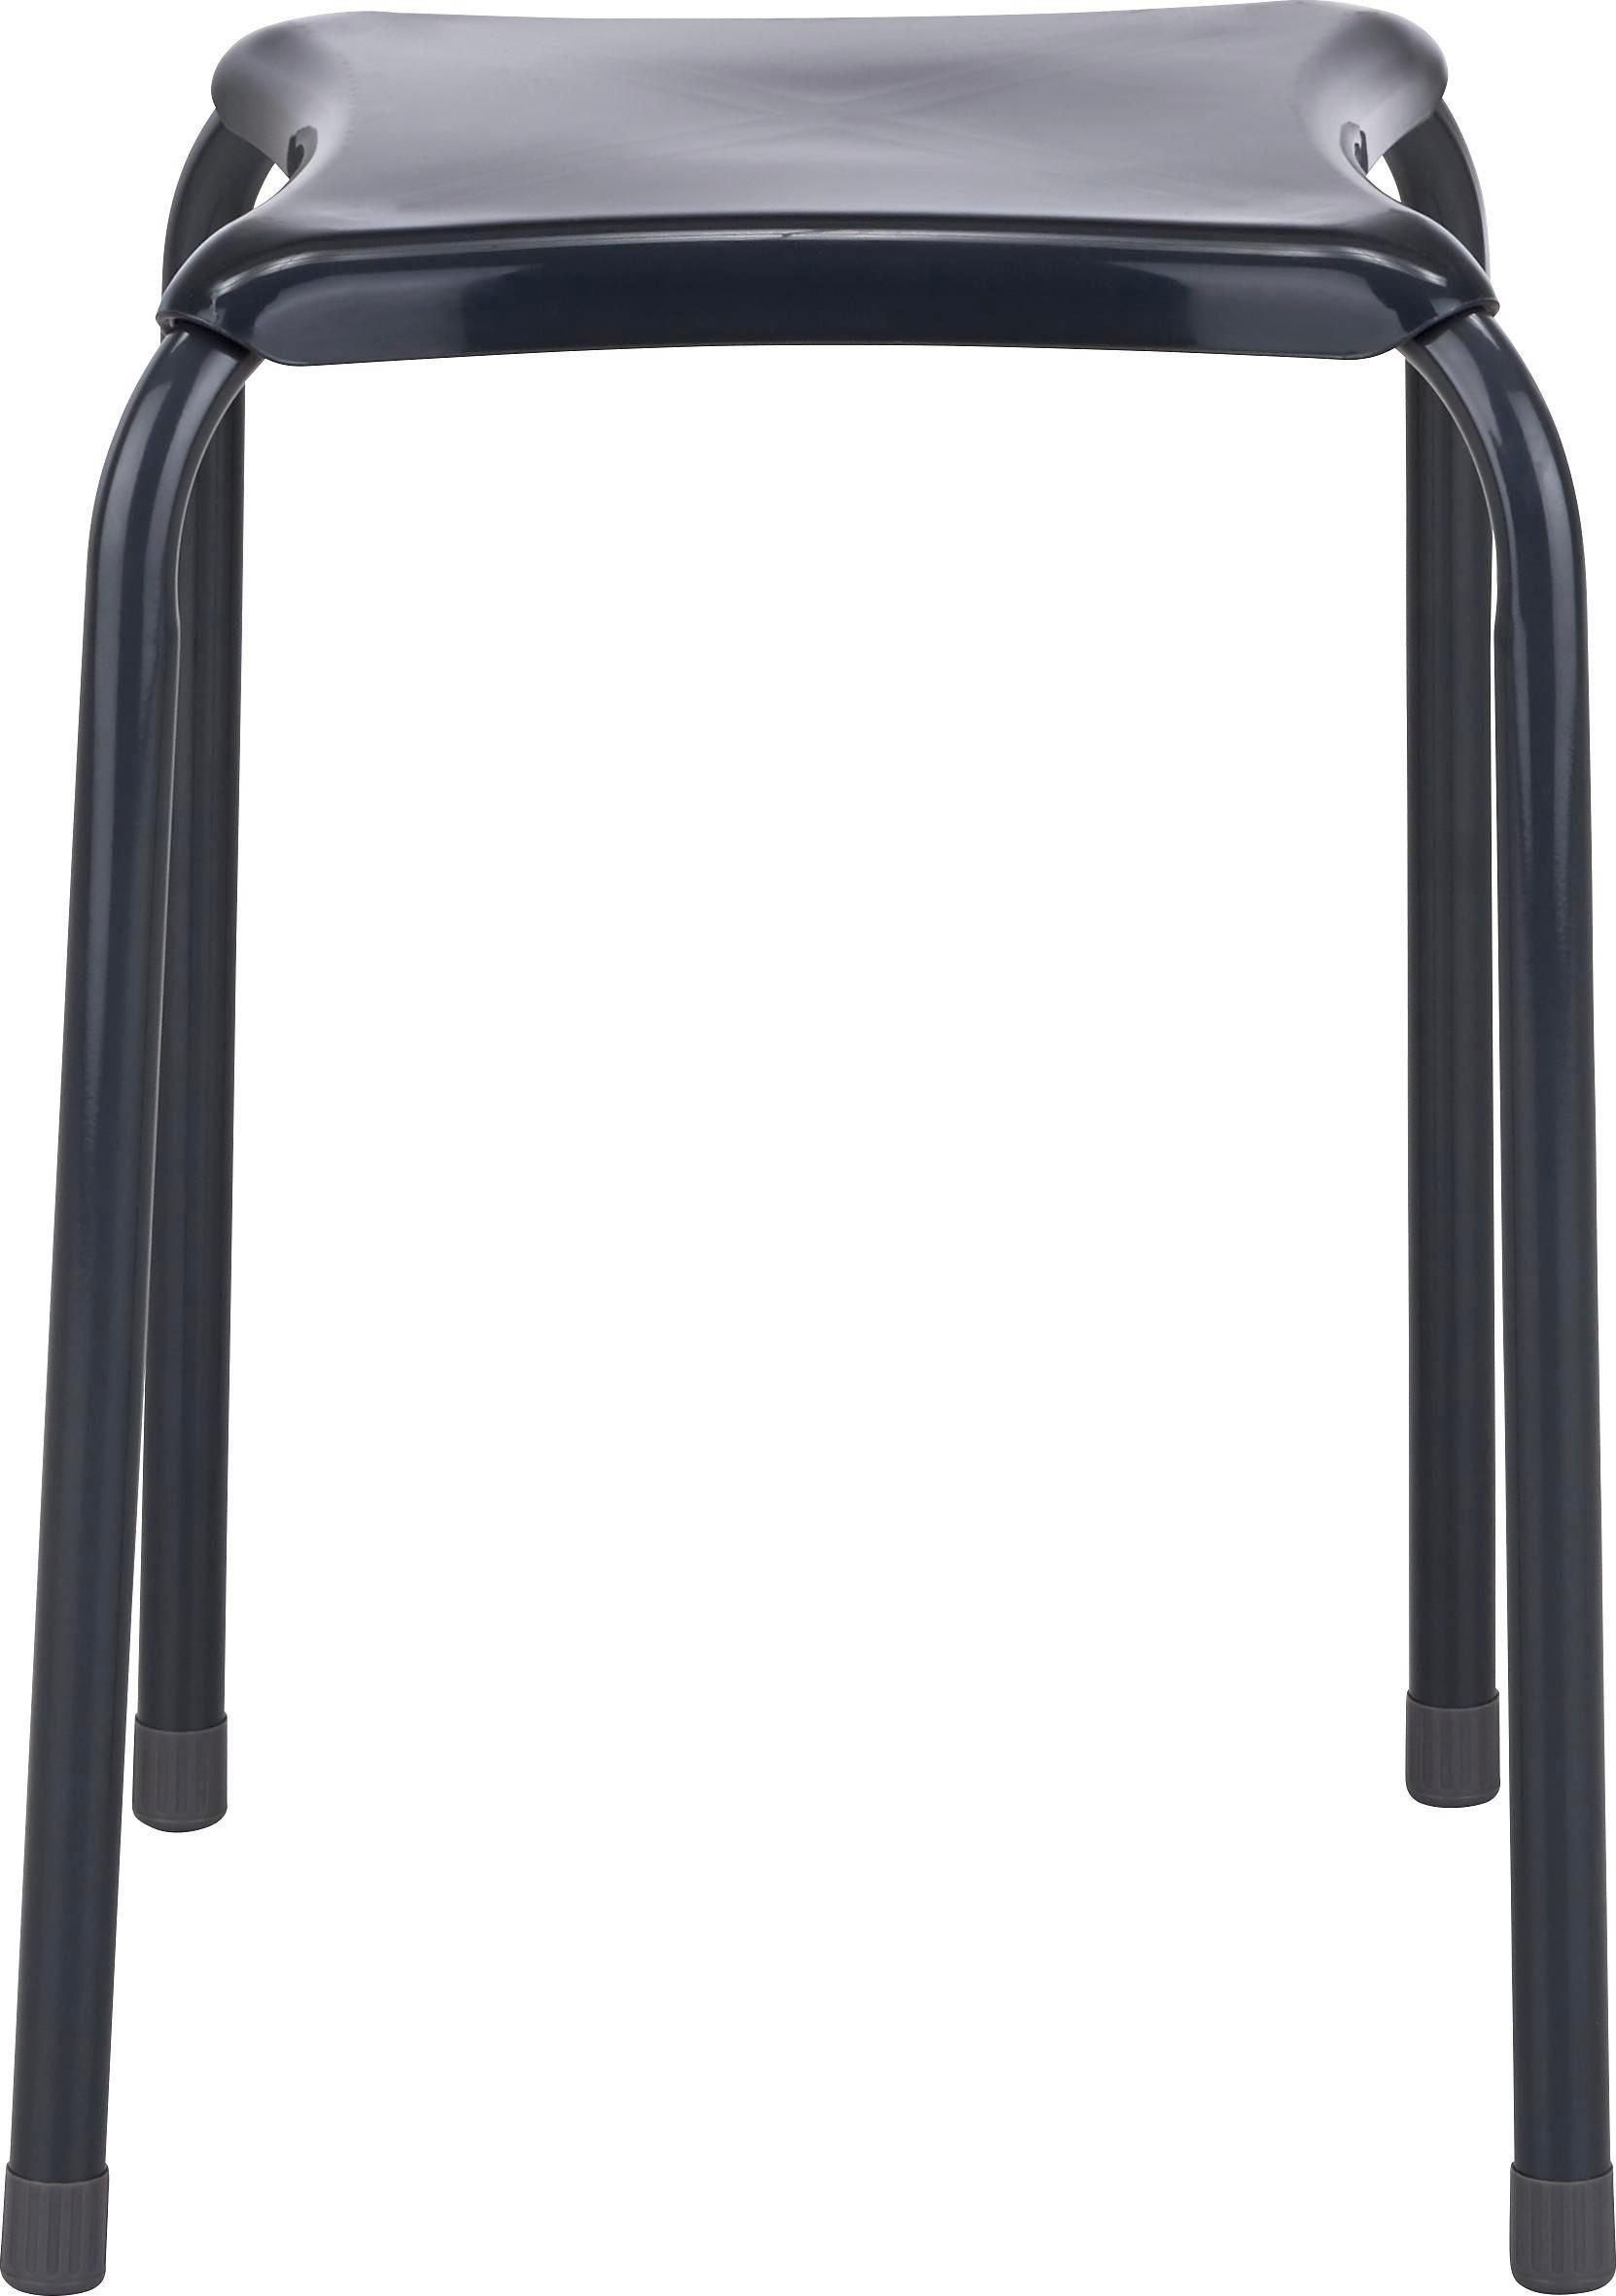 Stapelhocker in Grau aus Metall - Grau, Kunststoff/Metall (34/46/34cm) - MÖMAX modern living